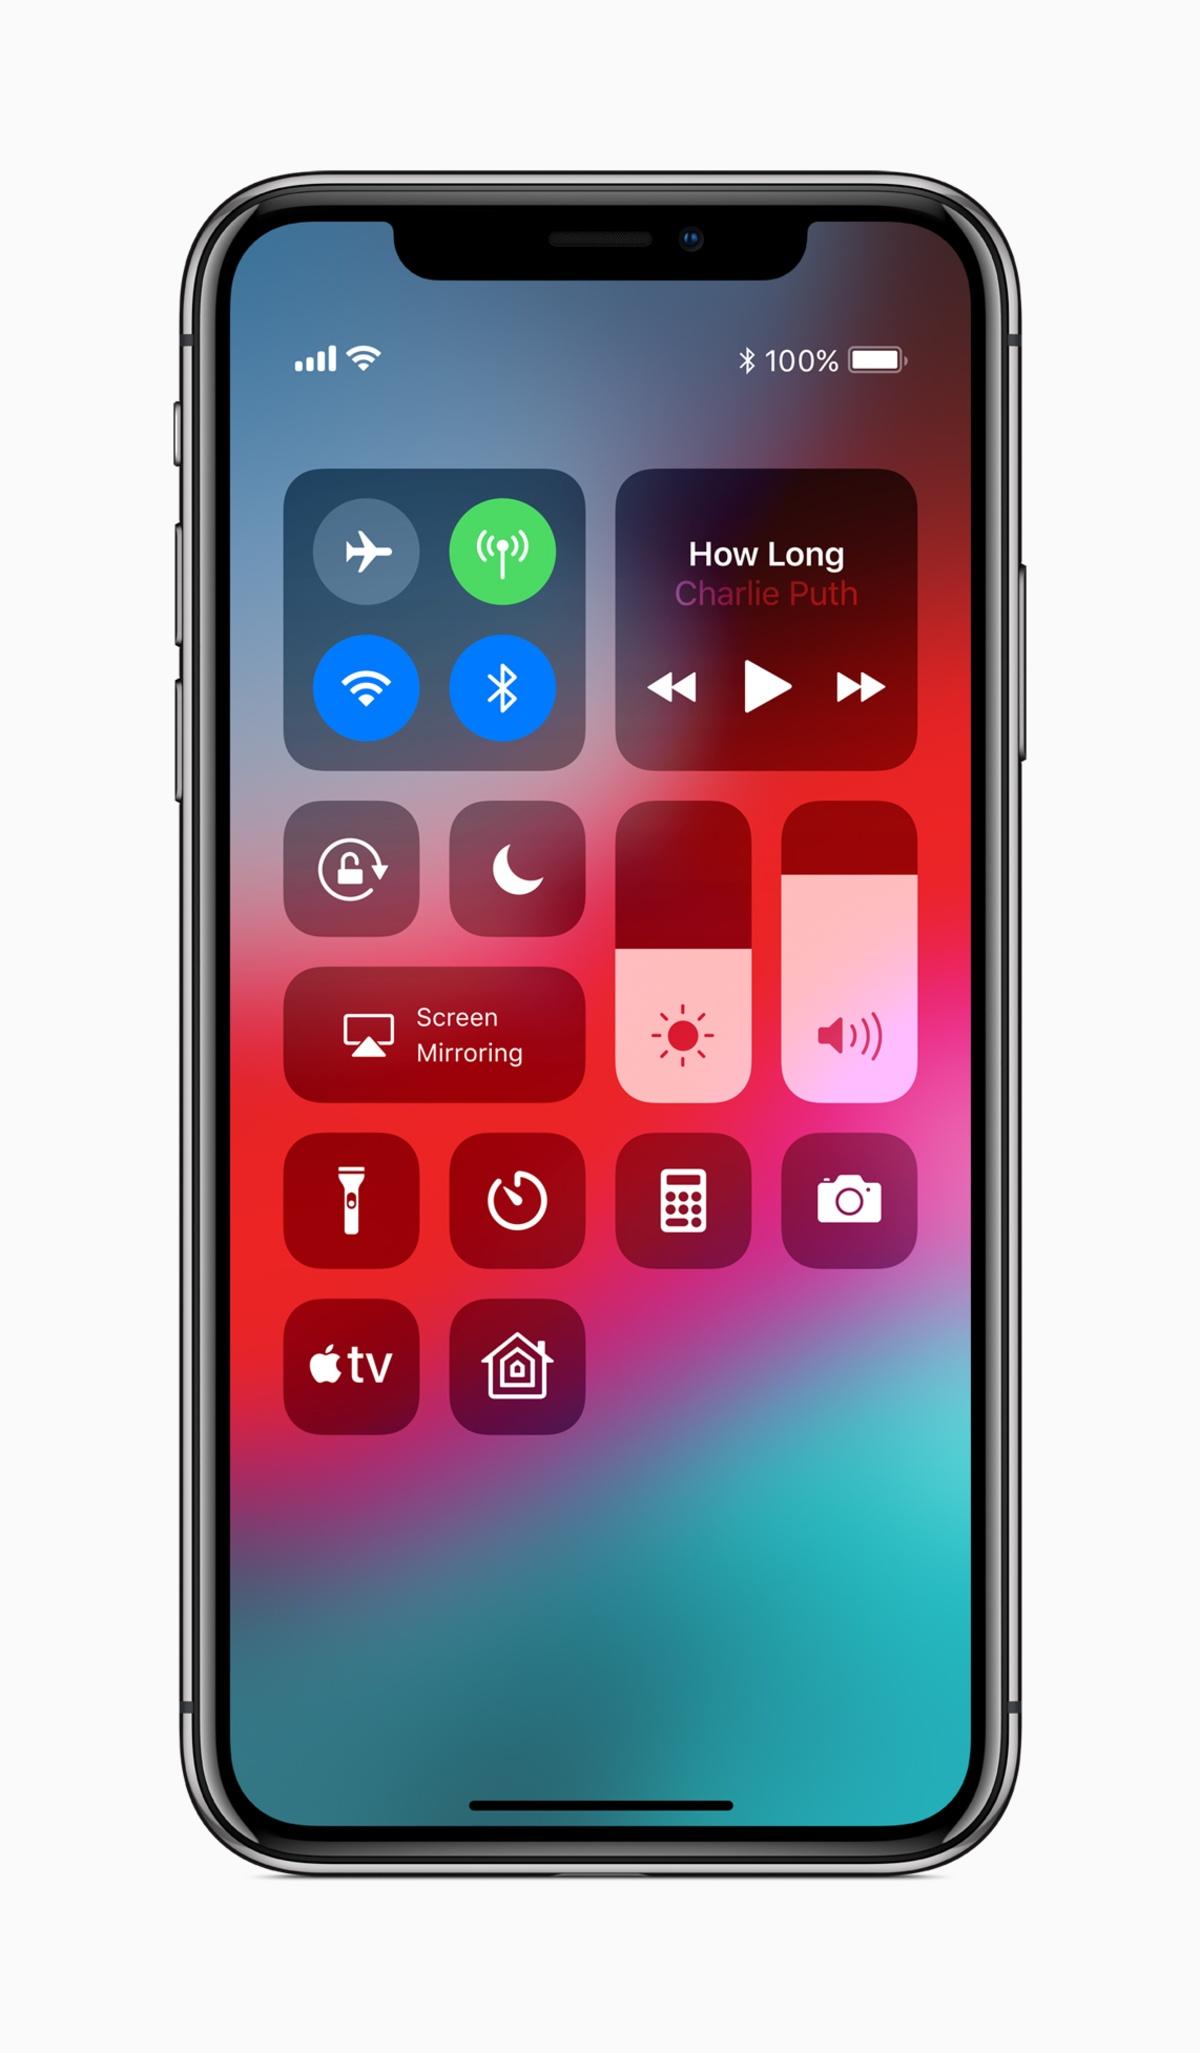 iphone denetim merkezi apple tv kumanda